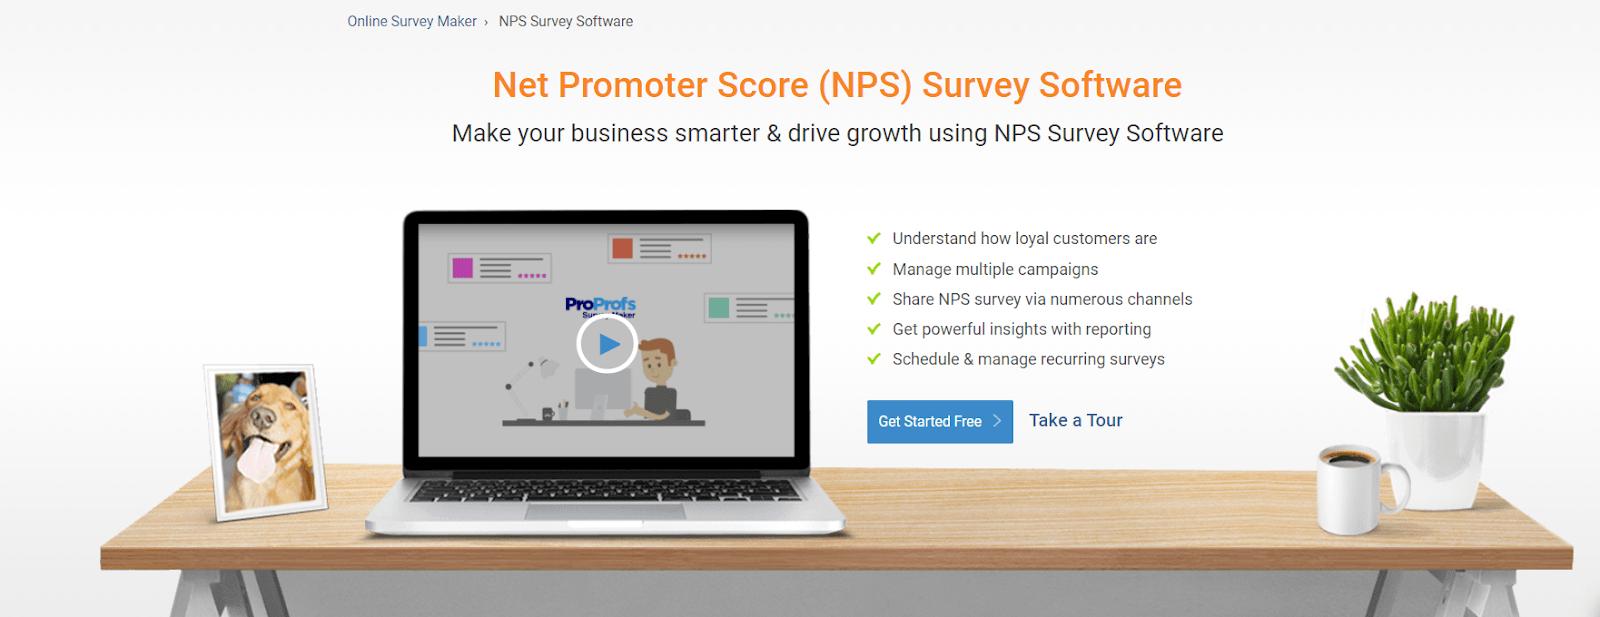 ProProfs-NPS Software